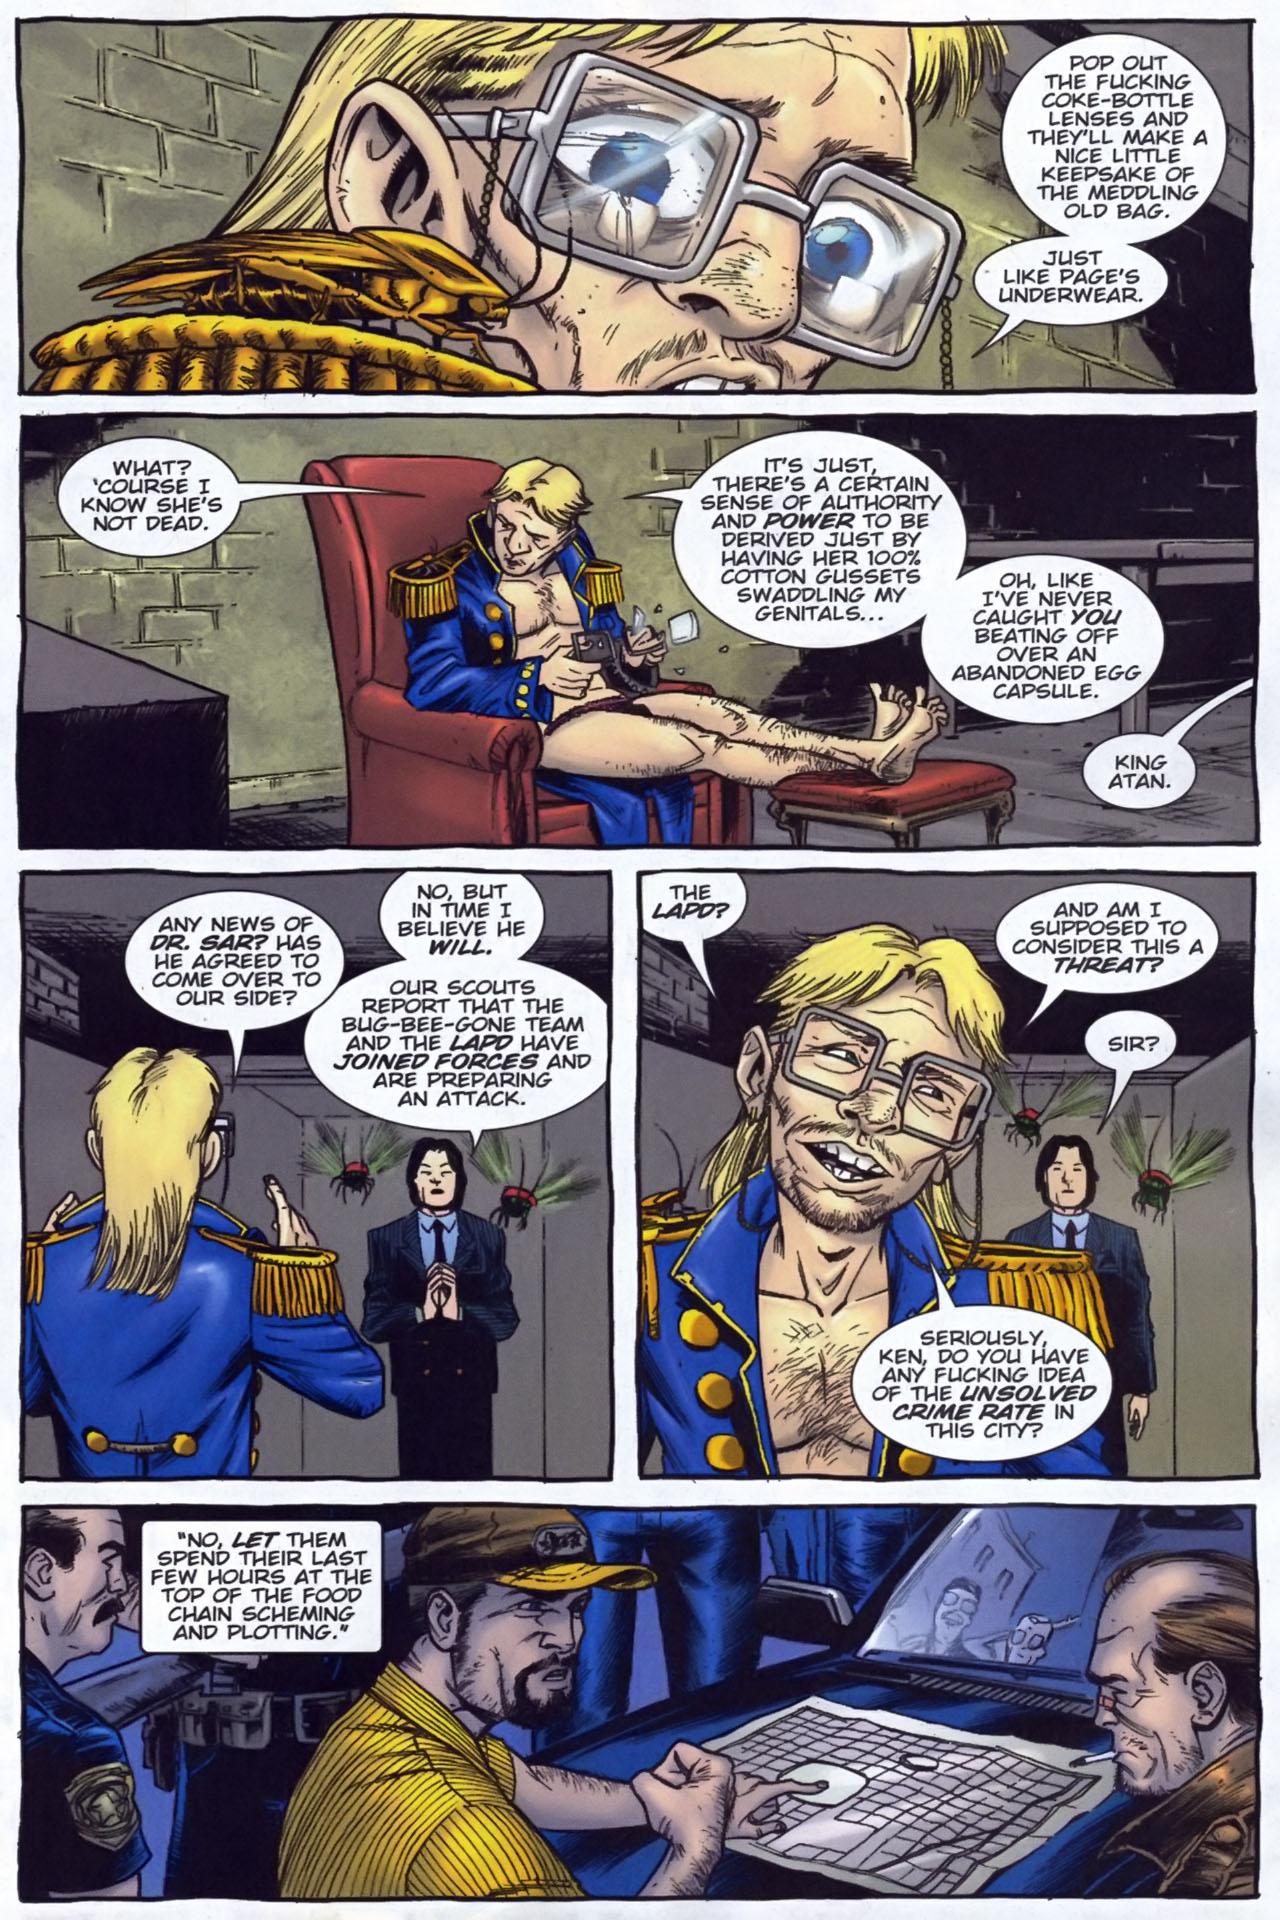 Read online The Exterminators comic -  Issue #29 - 7